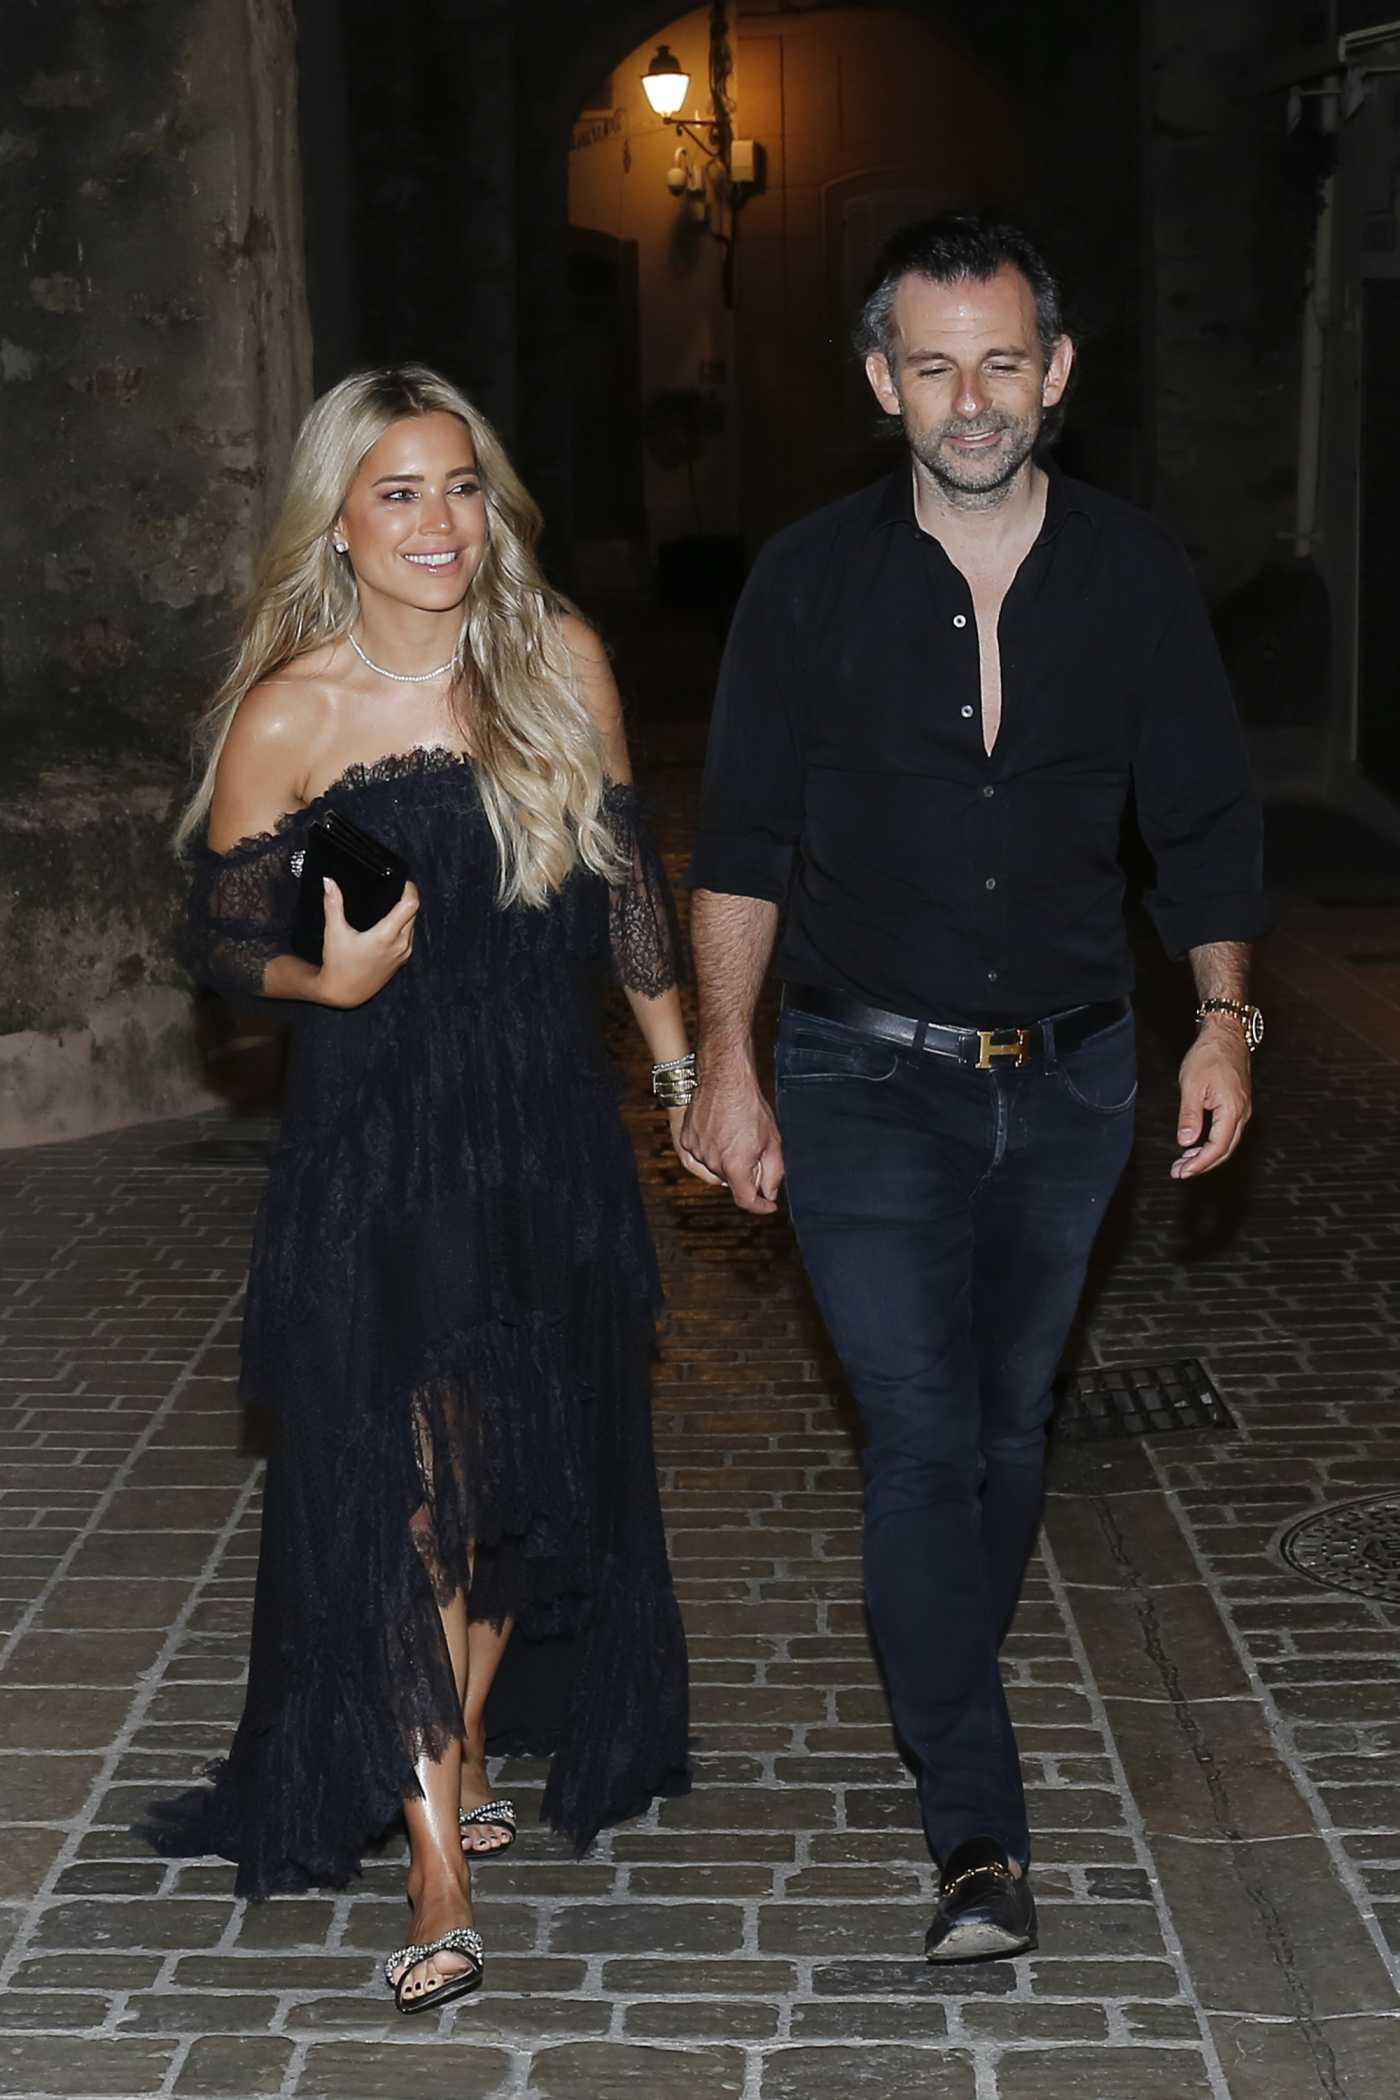 Sylvie Meis in a Black Dress Enjoys a Romantic Stroll in Saint Tropez 06/21/2020